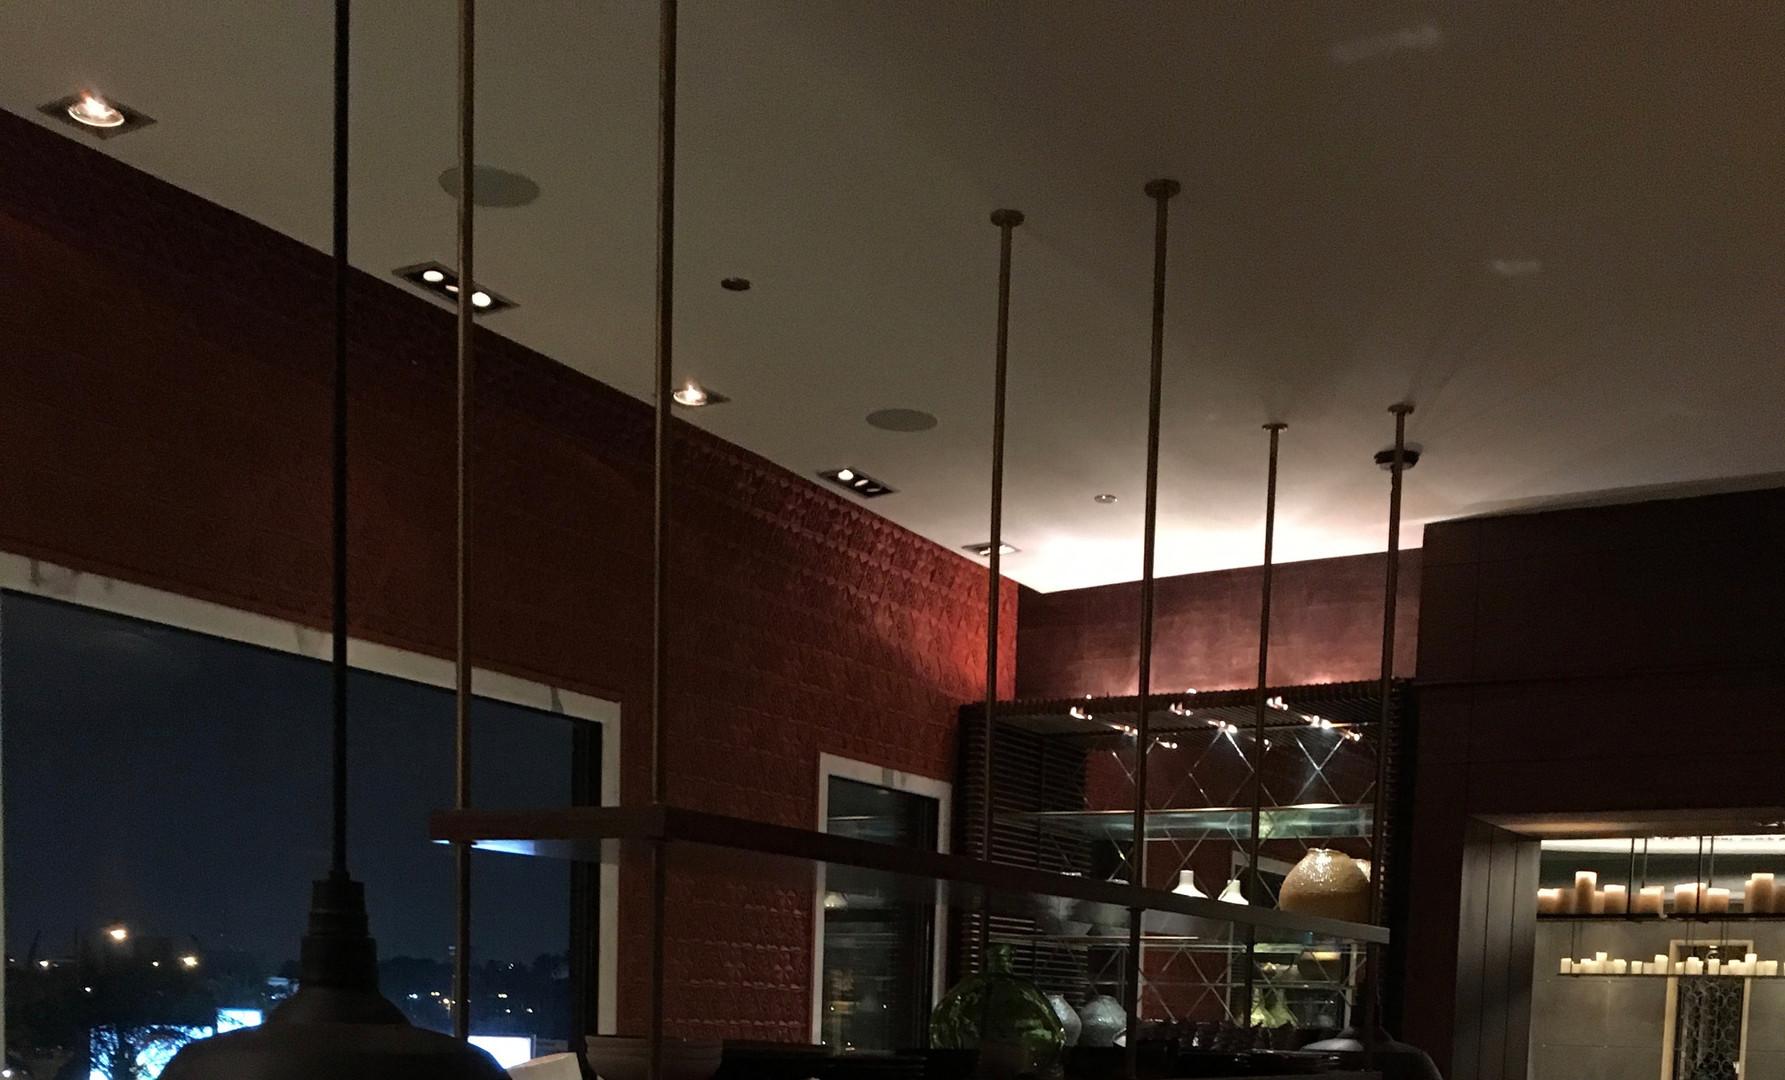 Rico - Contemporary Spanish restaurant